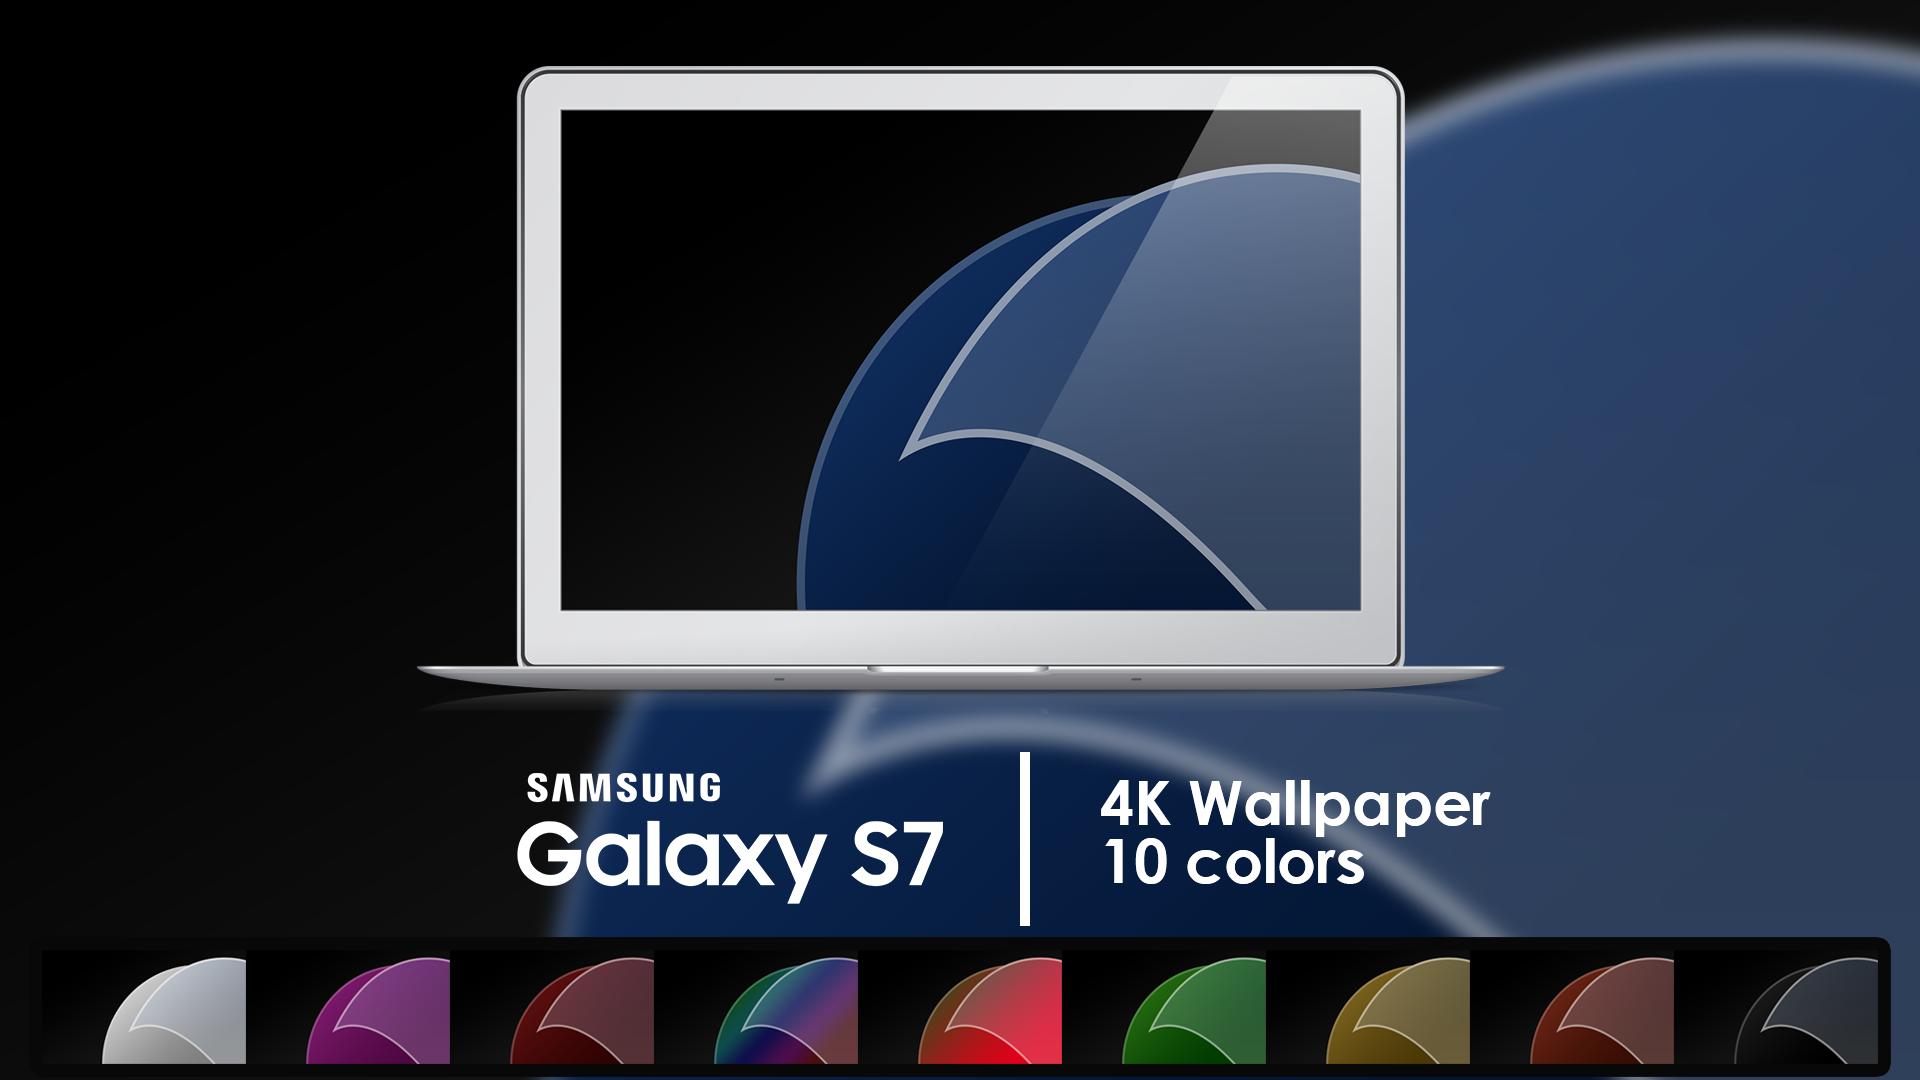 Samsung Galaxy S7 Wallpaper Minimal 4k Colors By Milesandryprower On Deviantart